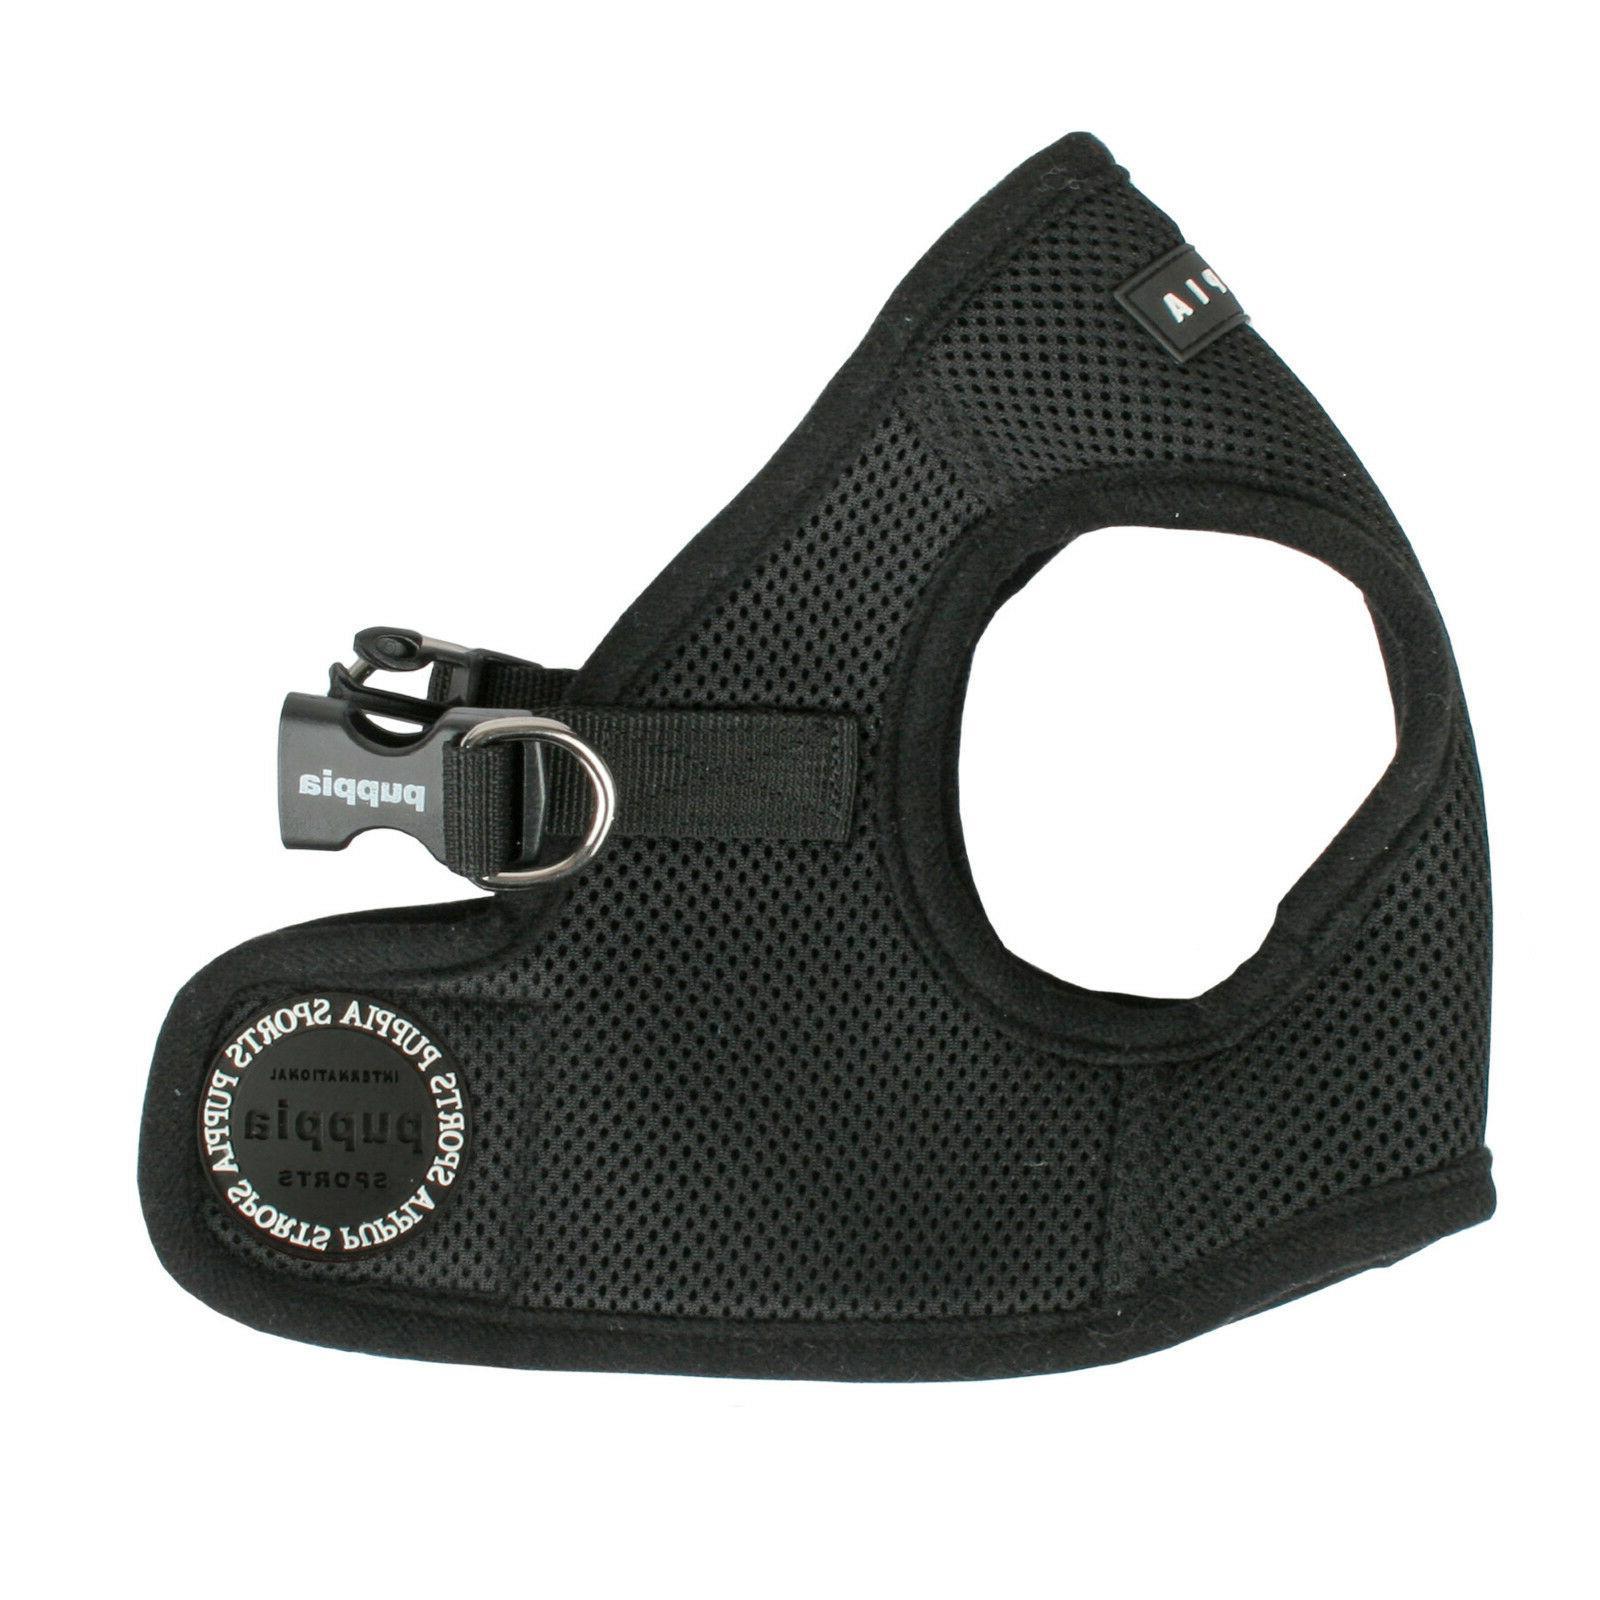 Puppia® Breathable Dog Harness - S M, XL, 3L AH305